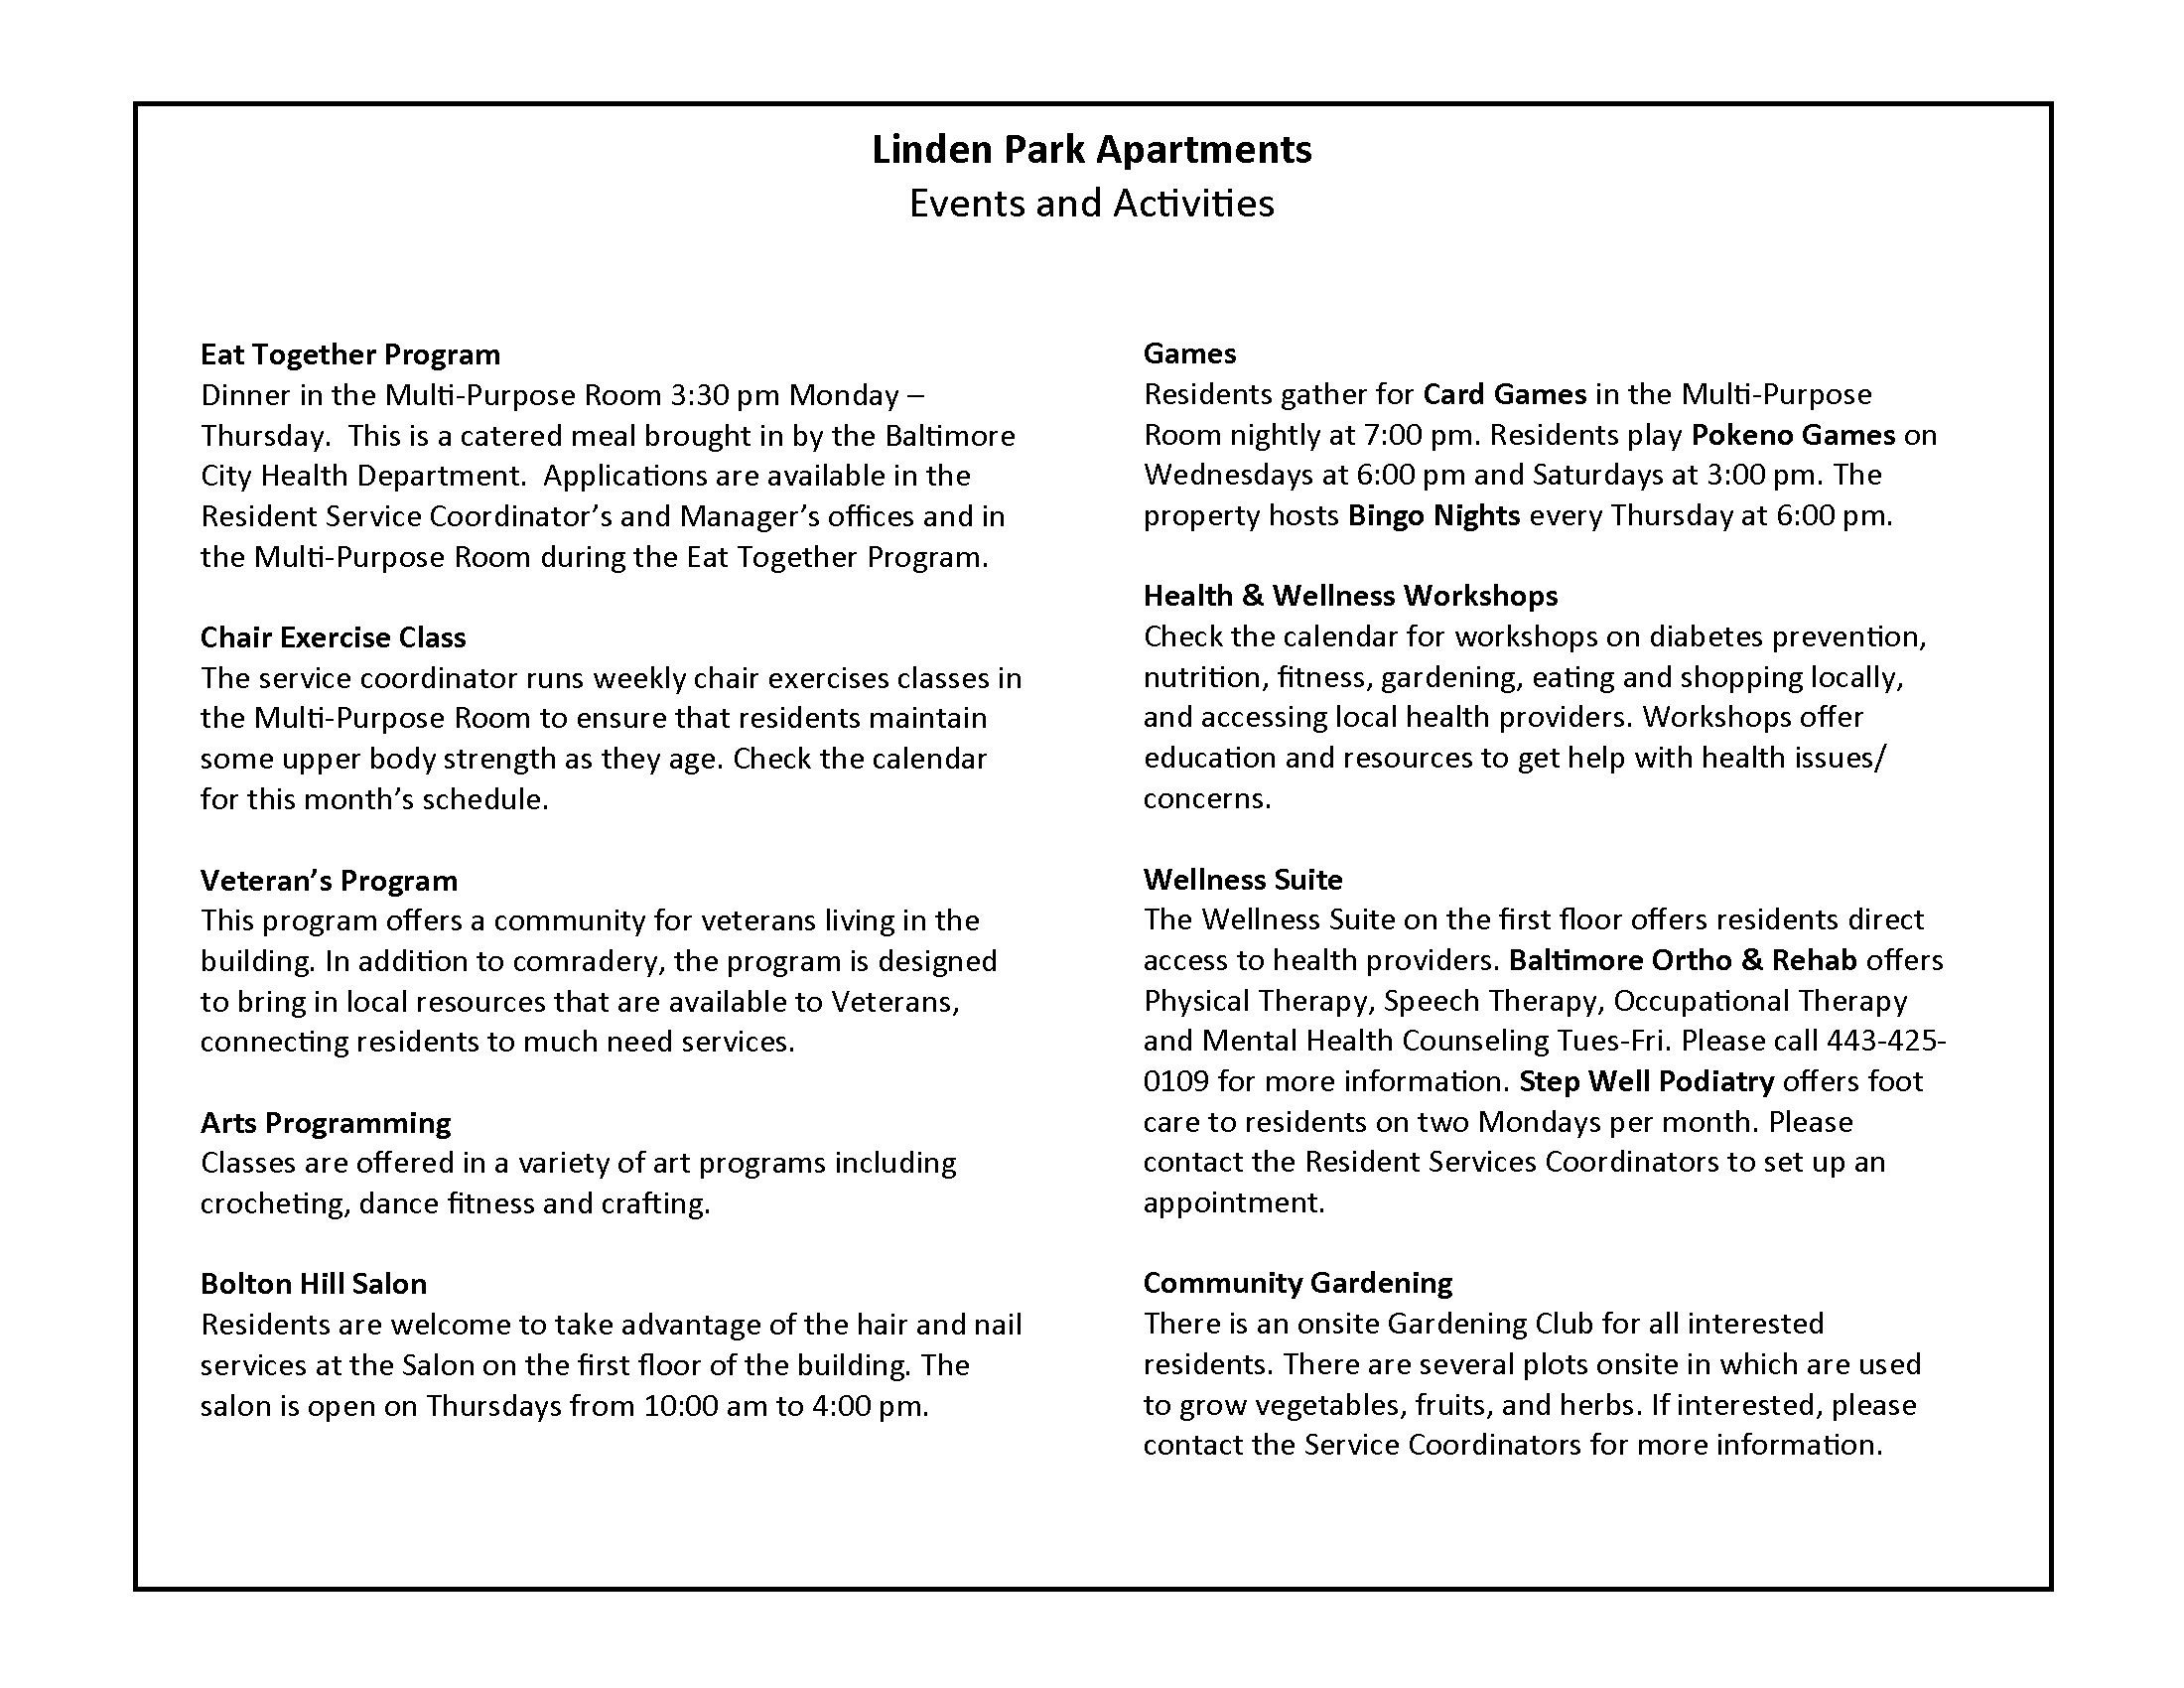 Linden Park January 2018 Activity Calendar Page 2